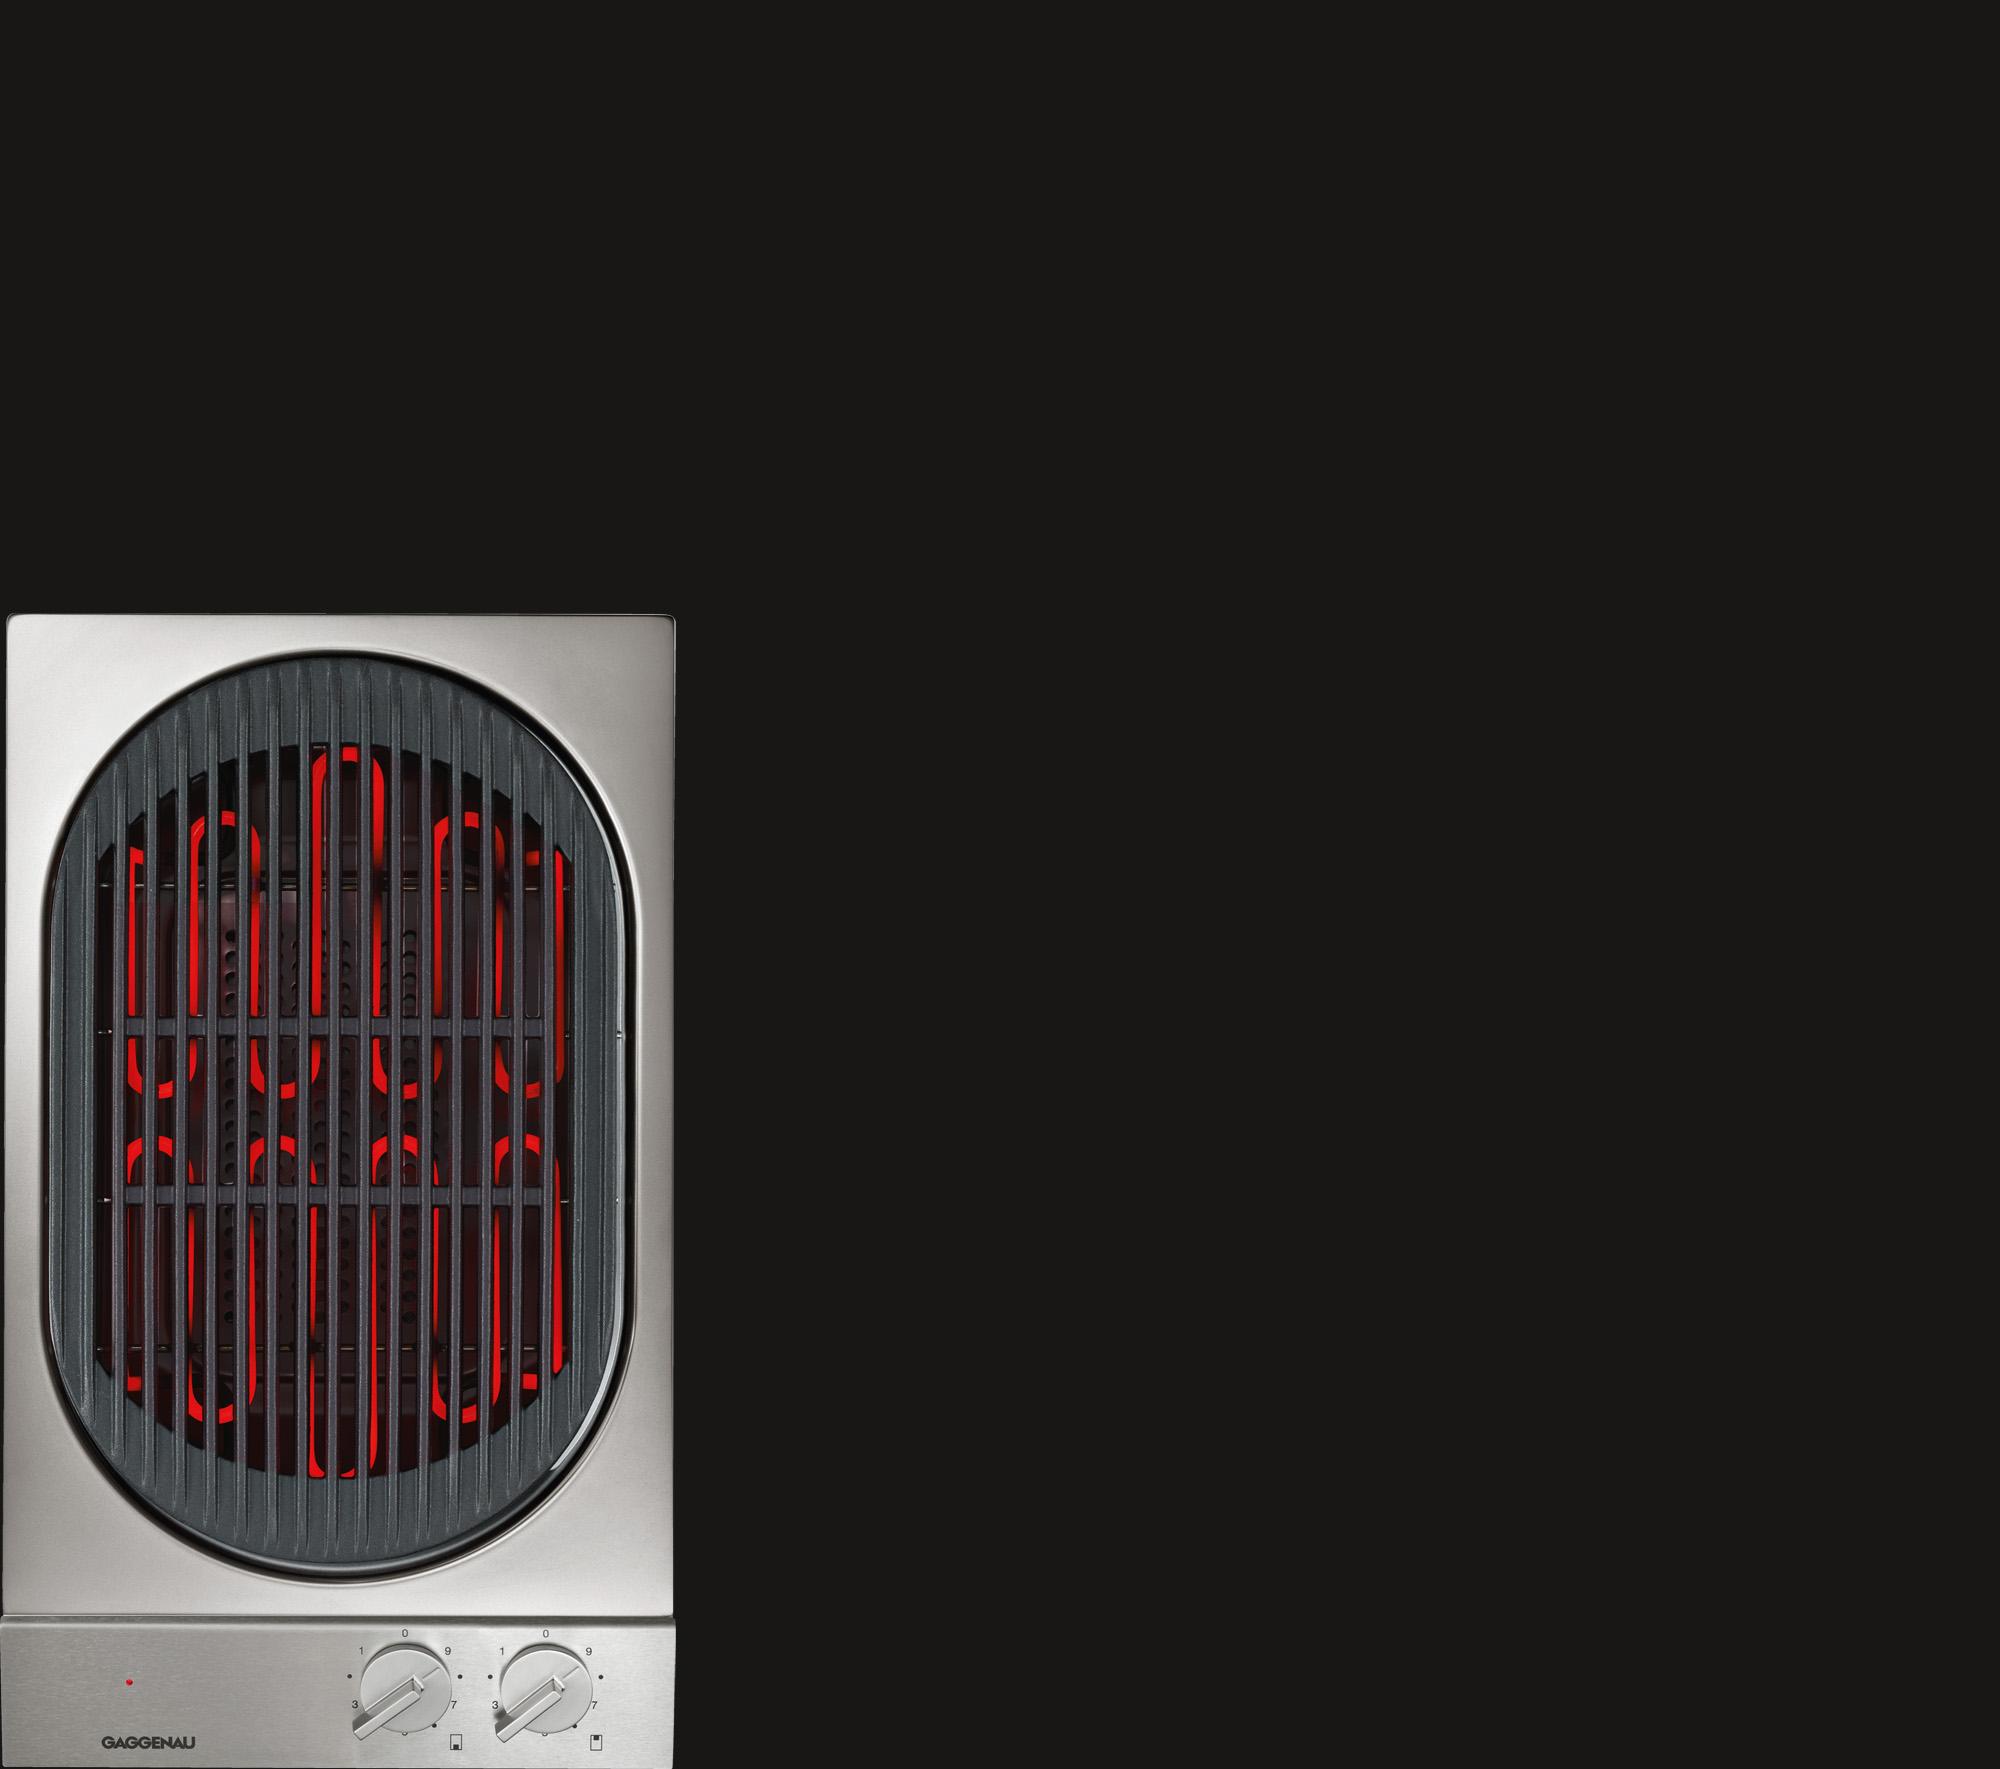 Электрический гриль GAGGENAU VR230114